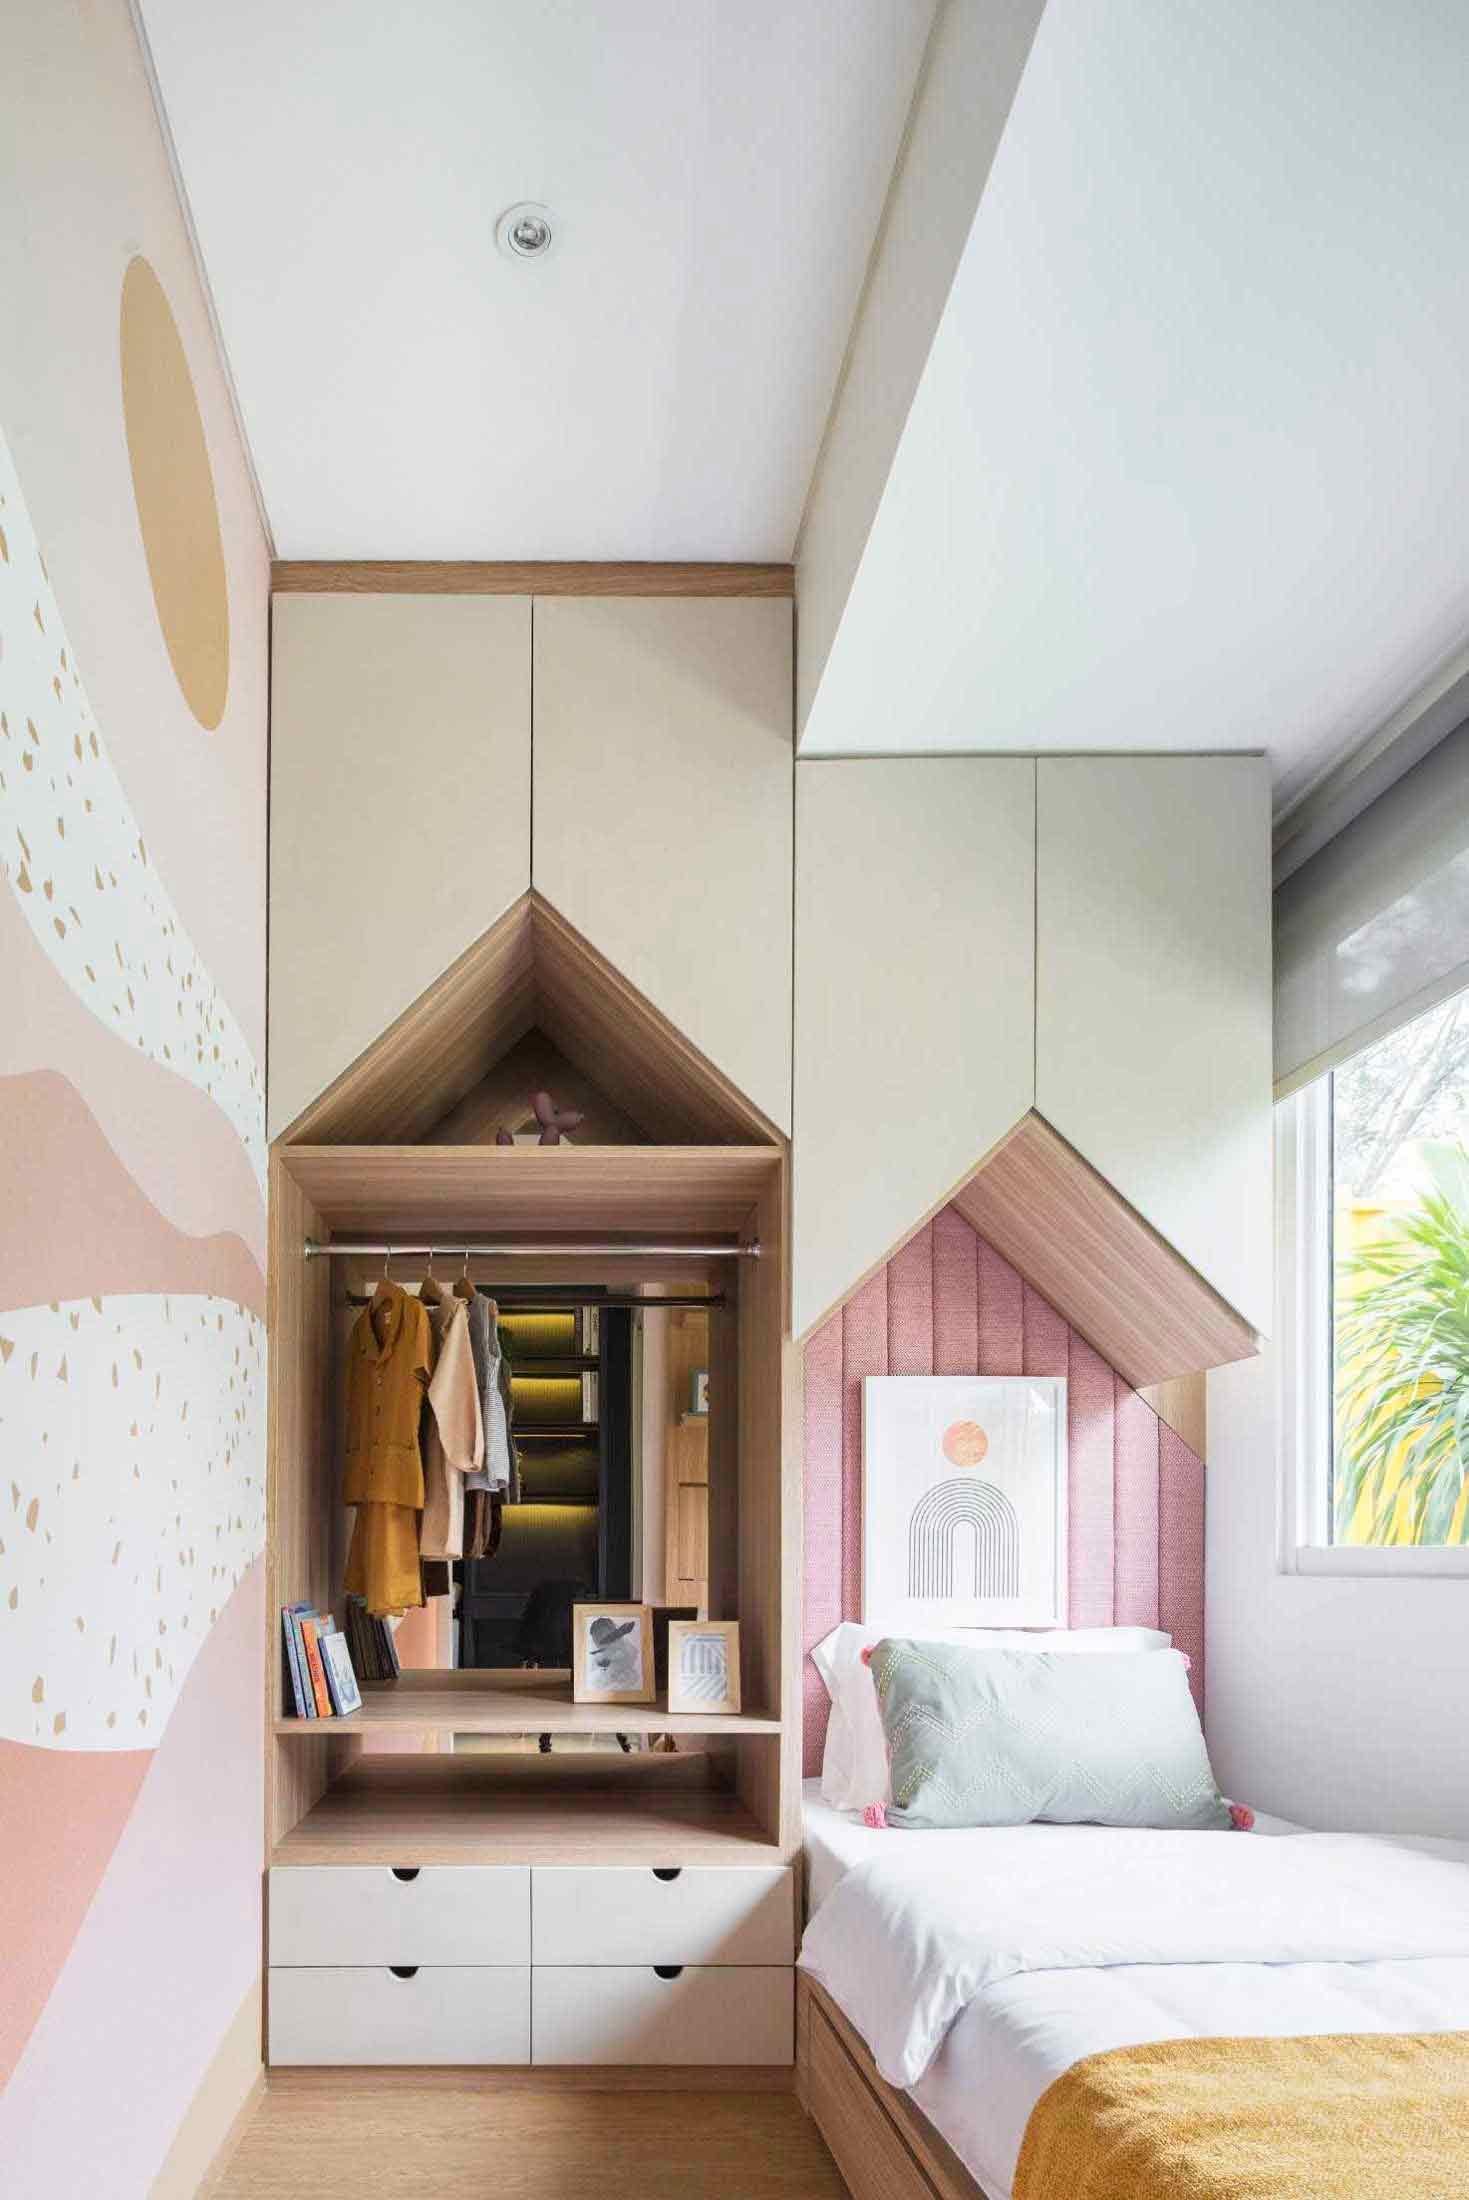 Kamar tidur anak bernuansa pink, karya Helloembryo, via Arsitag.com